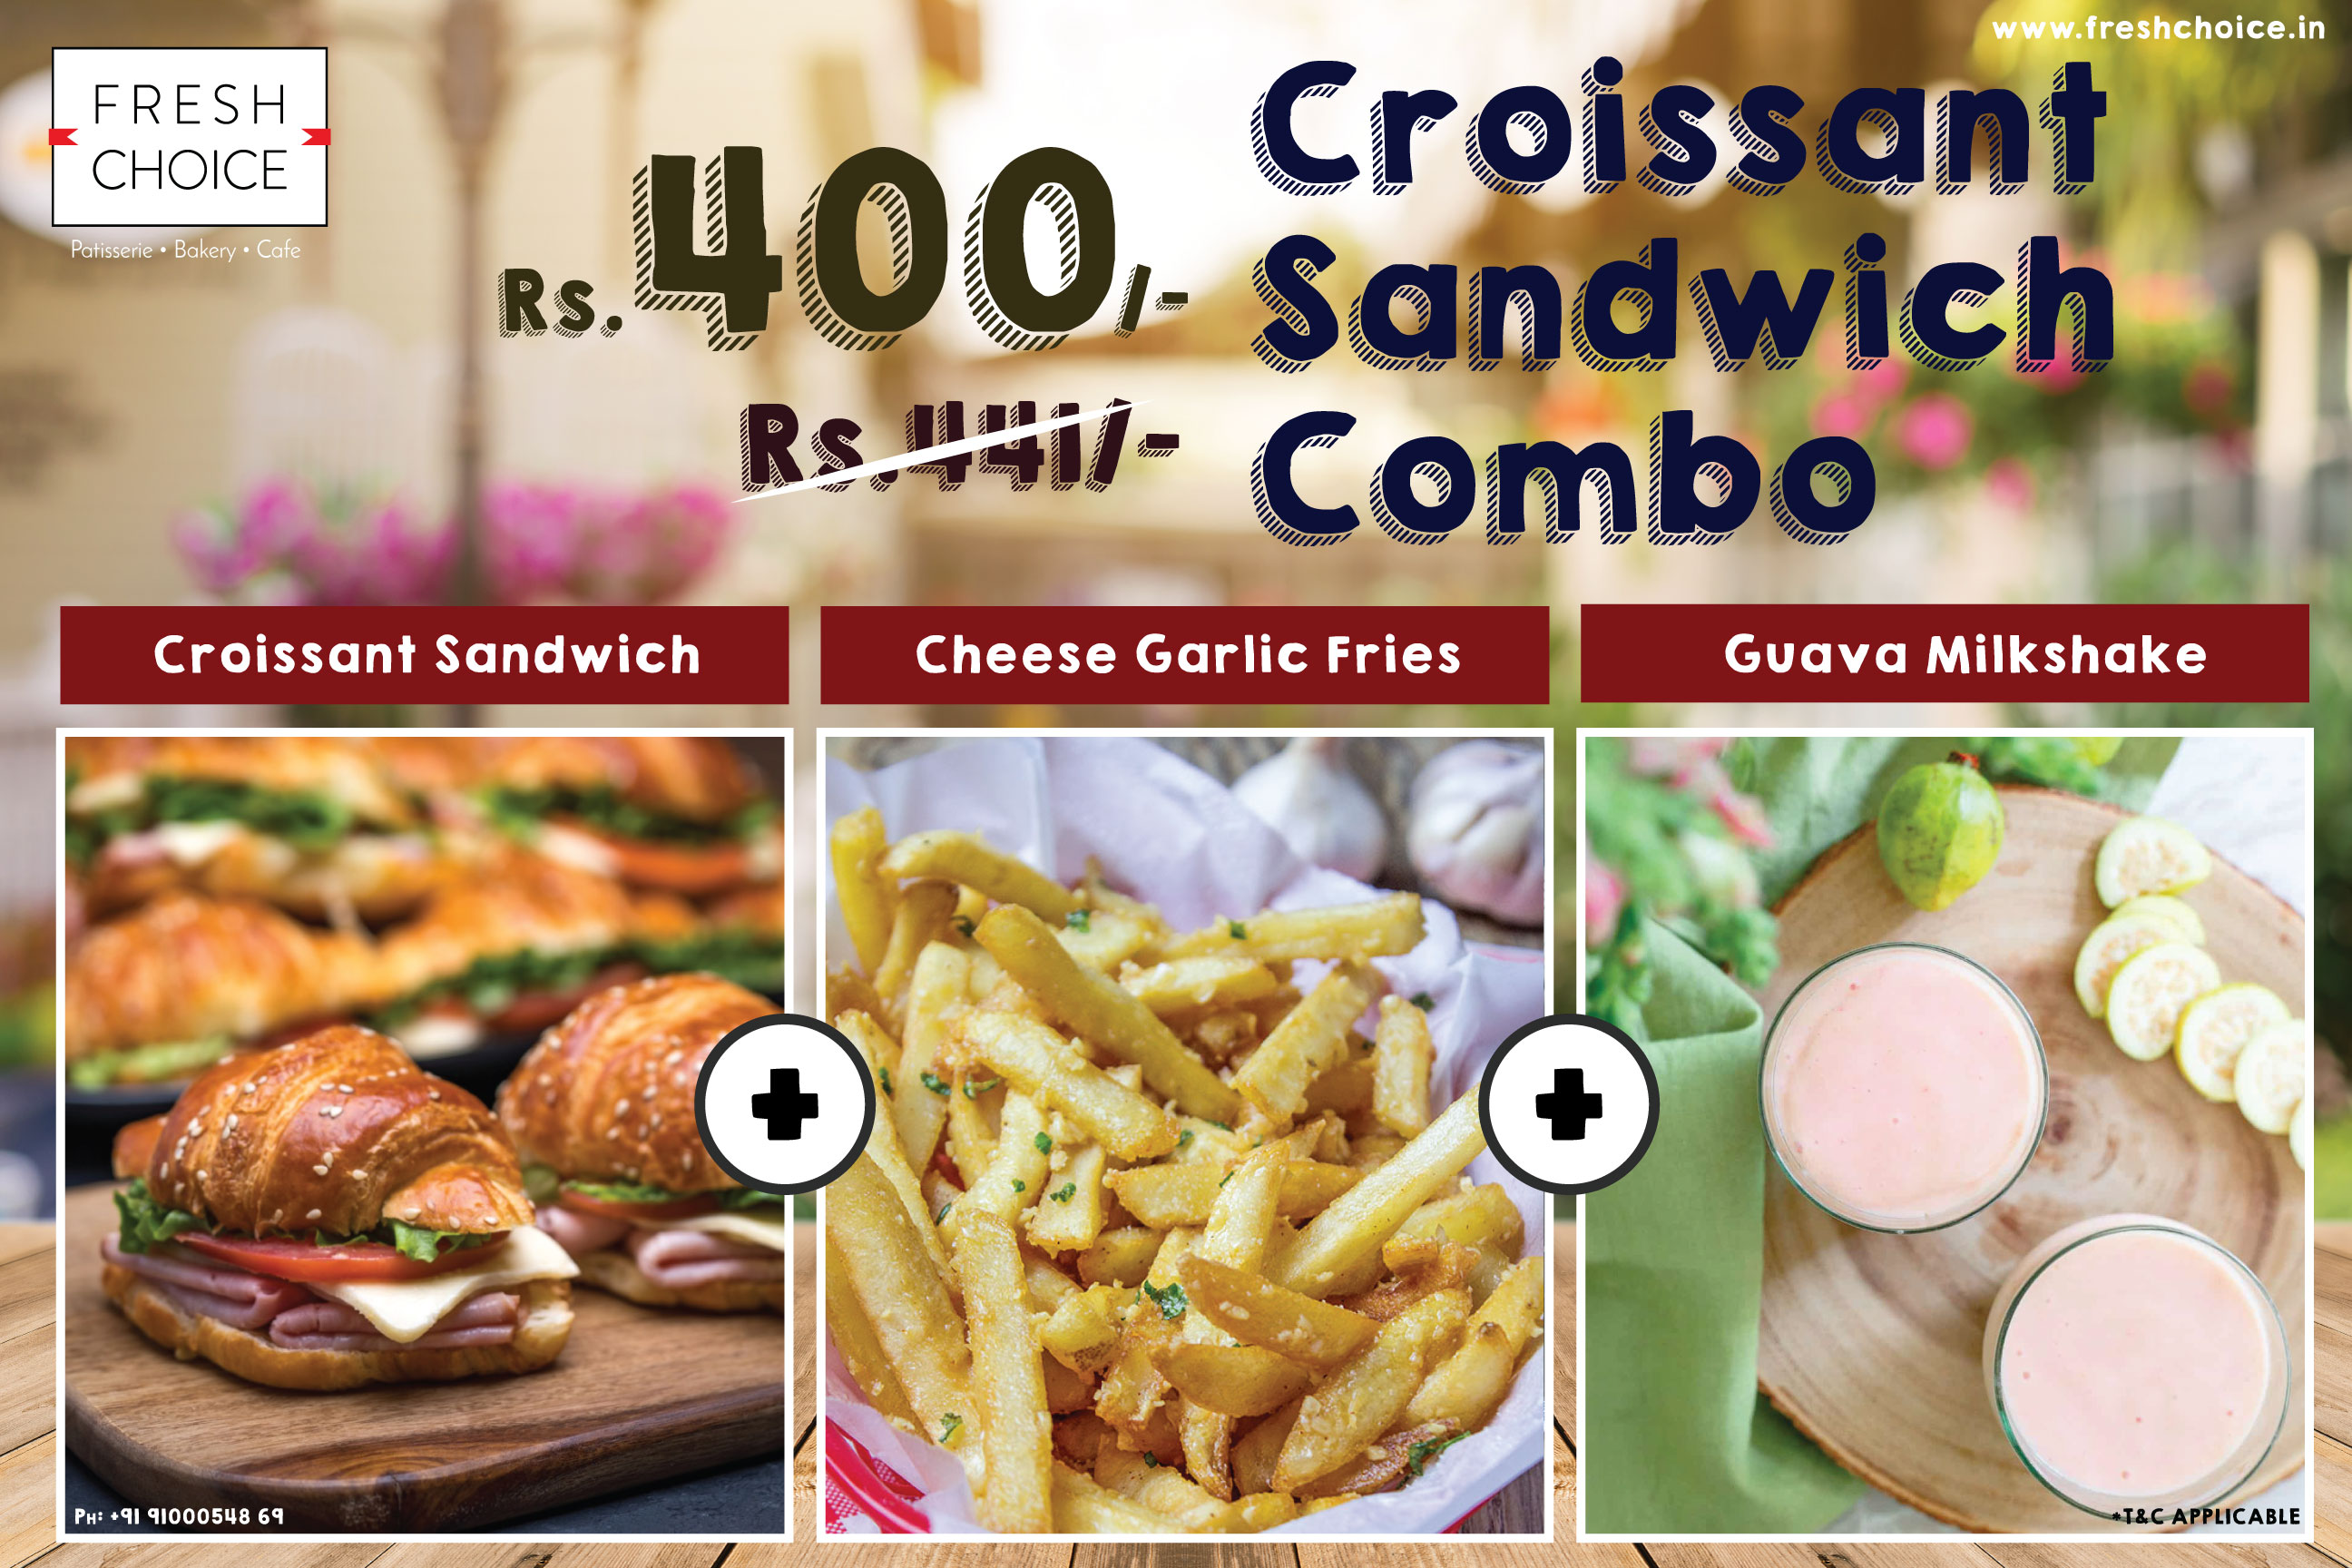 Croissant-Sandwich-Combo-Garlic-Fries